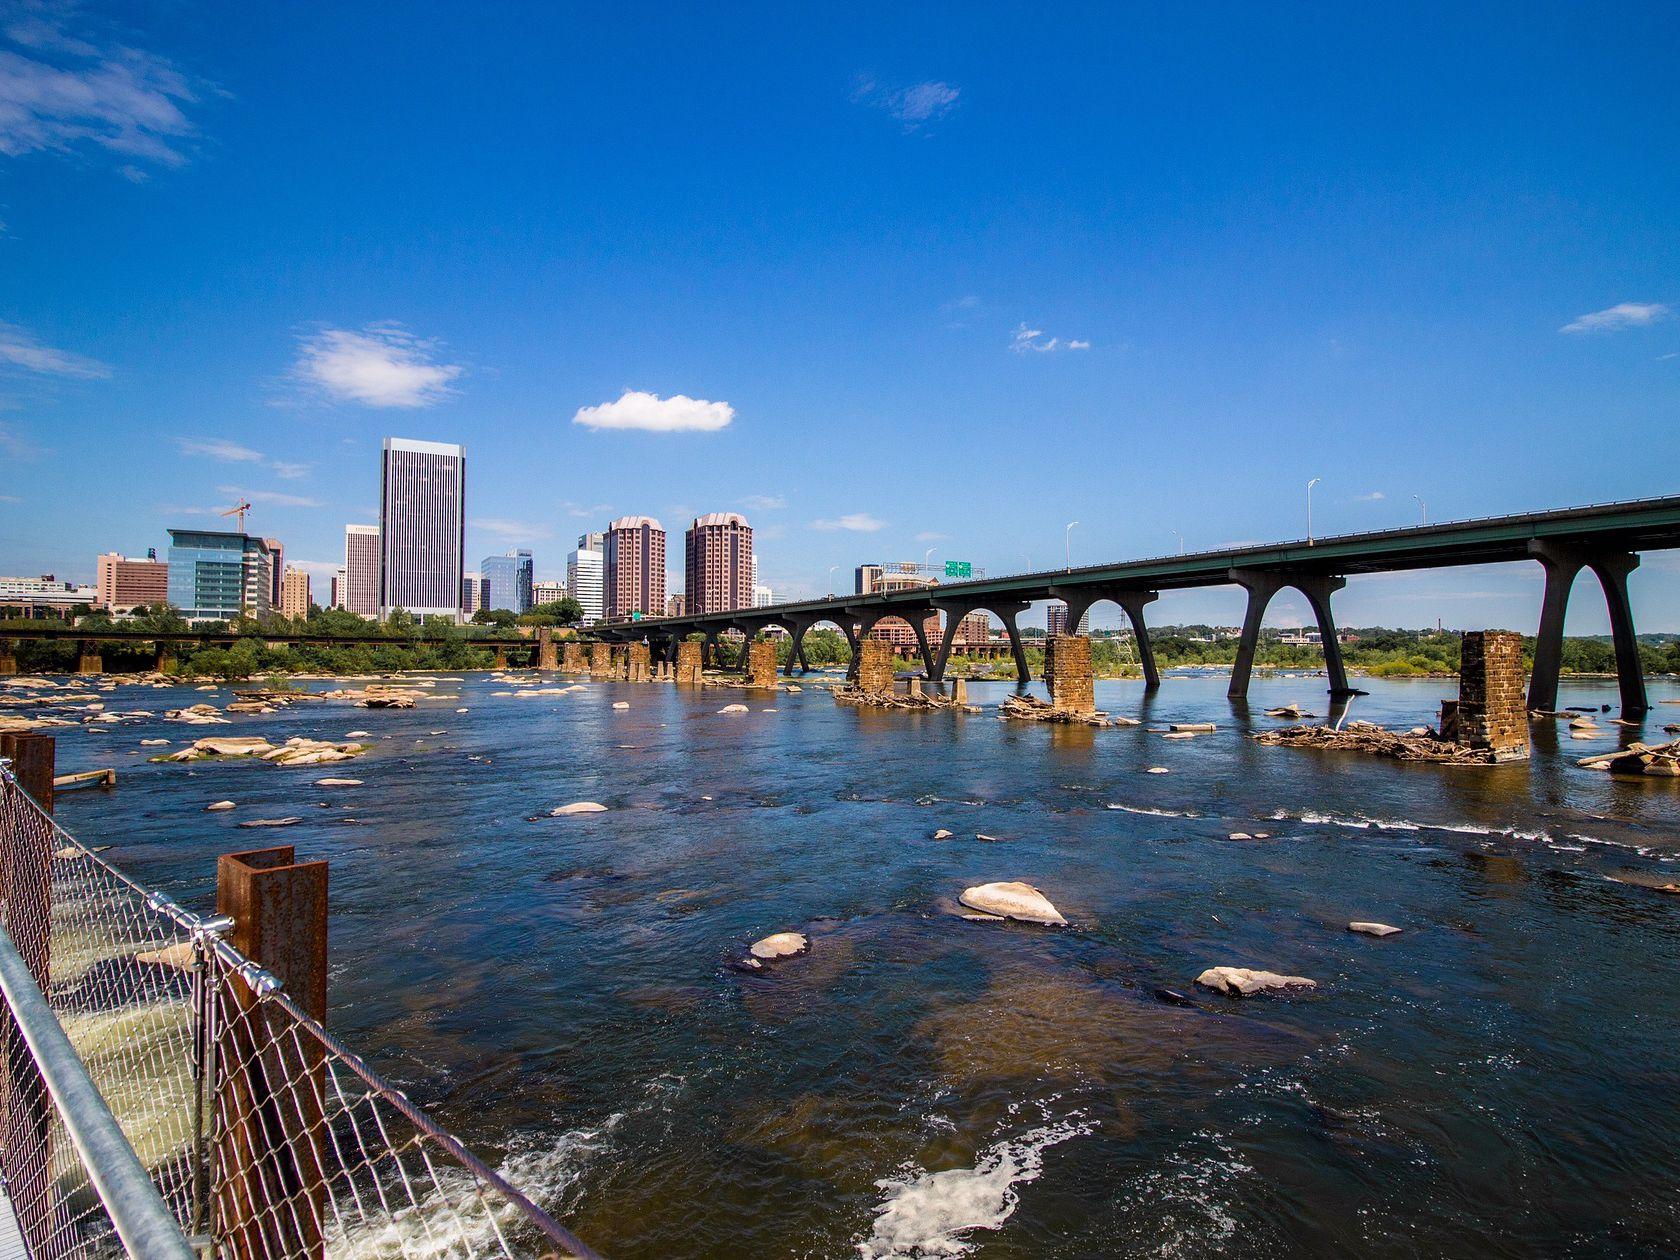 Richmond city leaders provide COVID-19 update